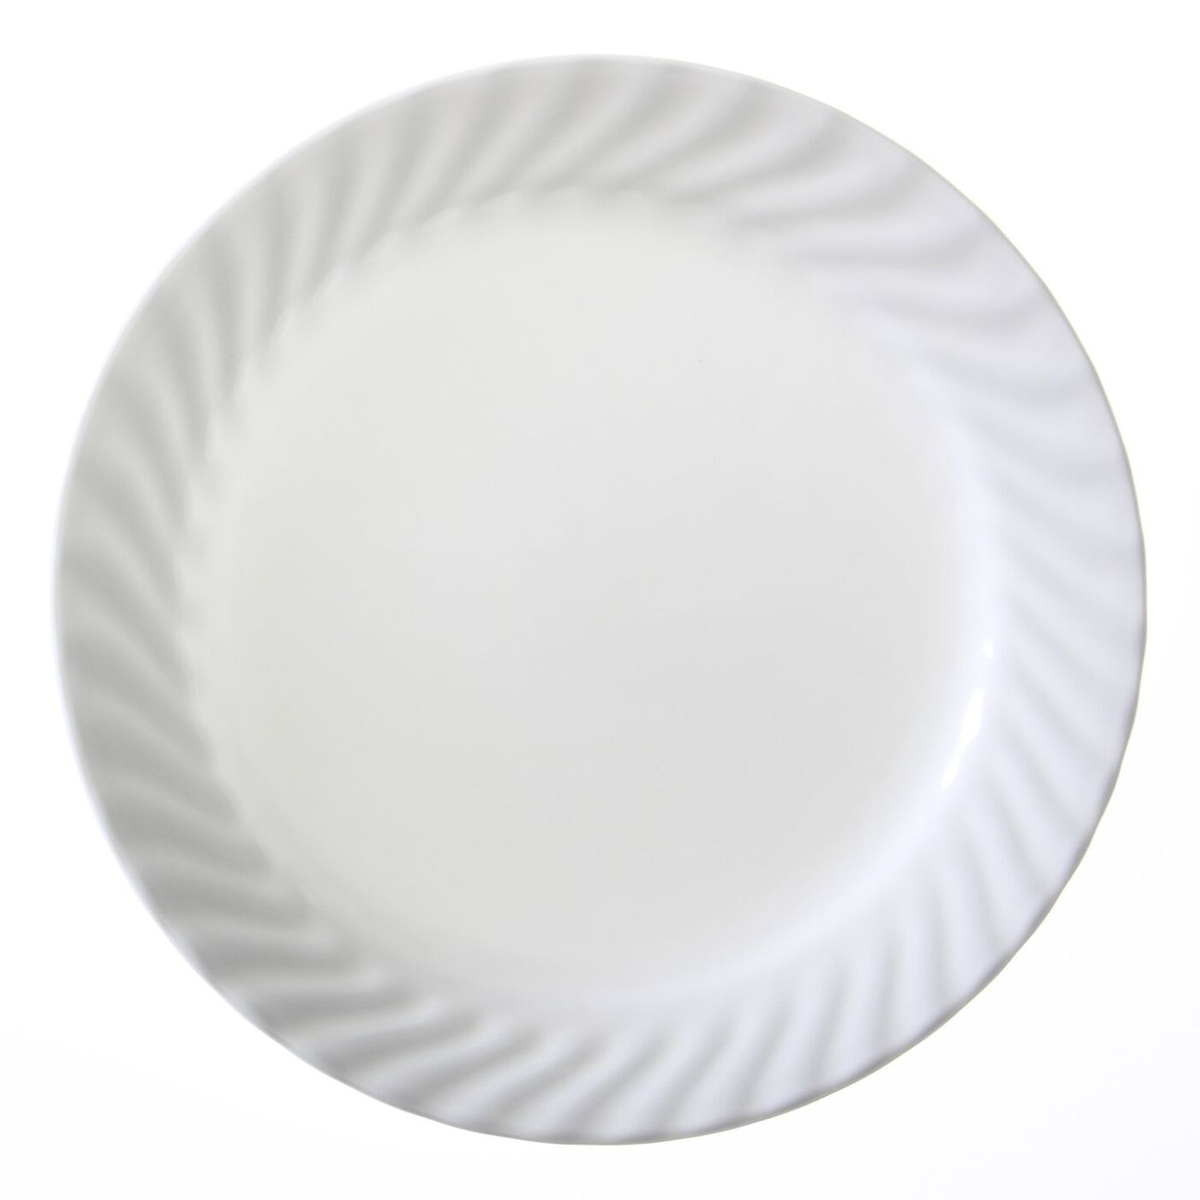 Тарелка закусочная Corelle Enhancements 23 см